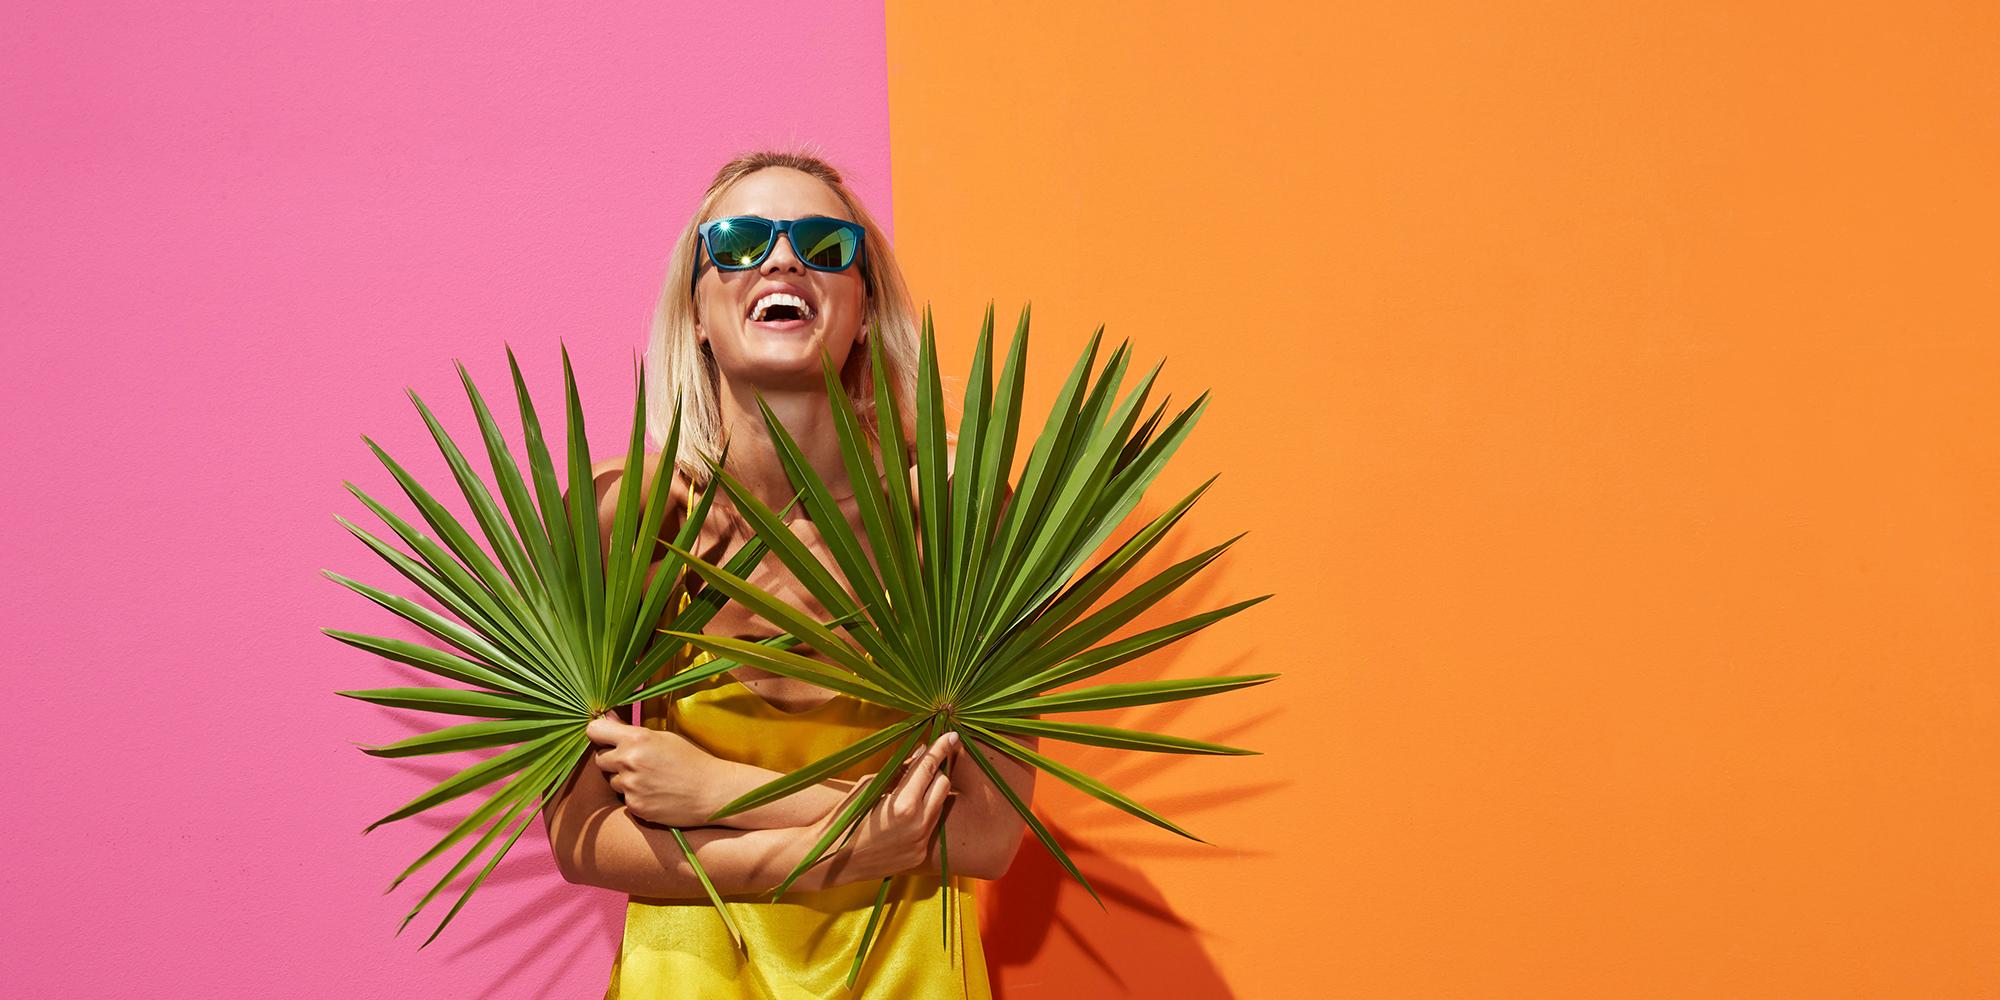 Blonde Frau mit Sonnenbrille Filtral uvex group